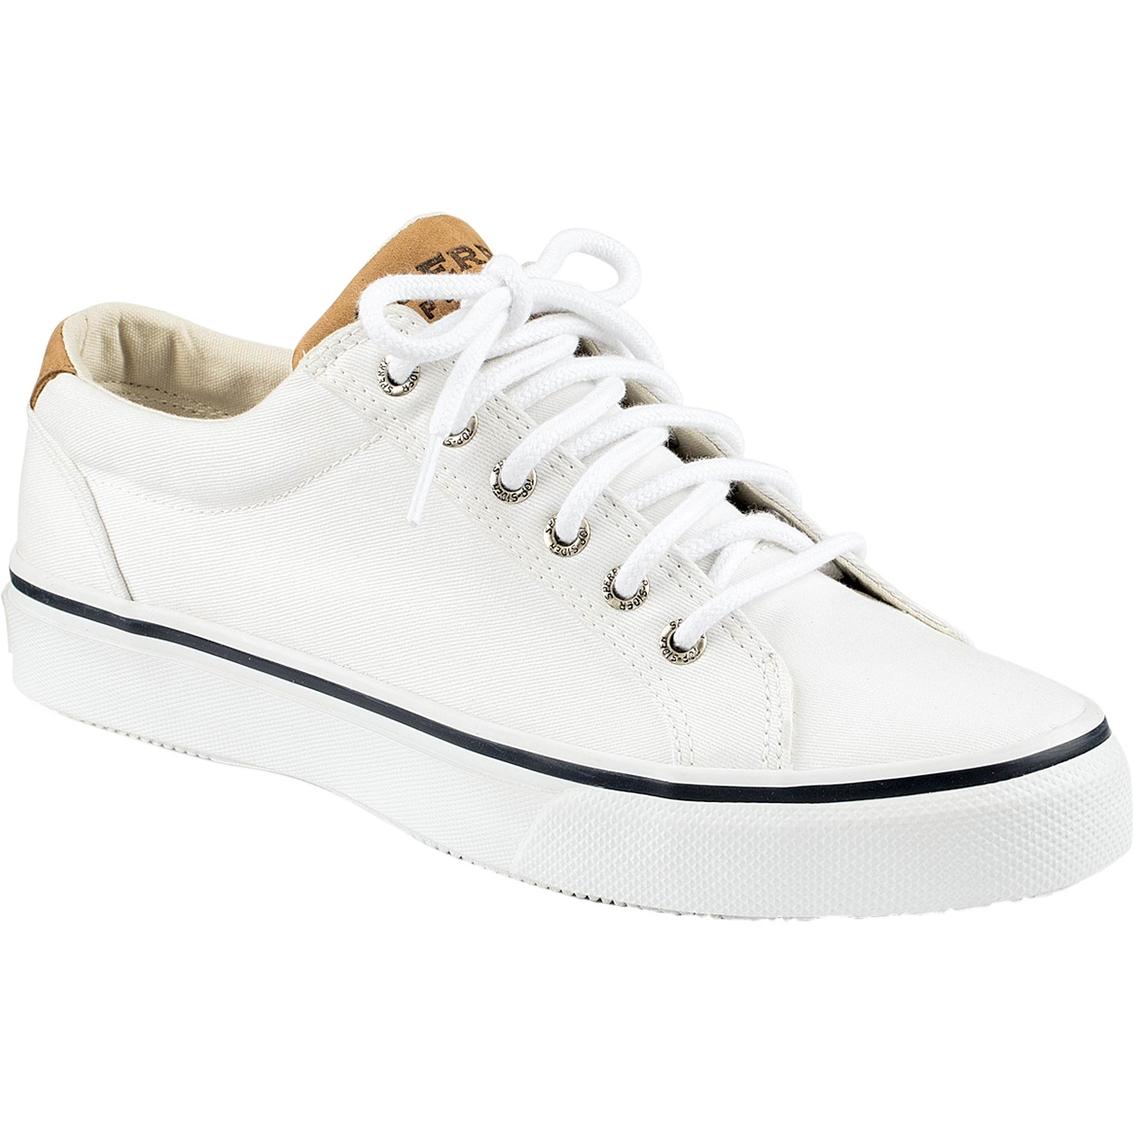 sperry striper ltt canvas shoes s clearance shop